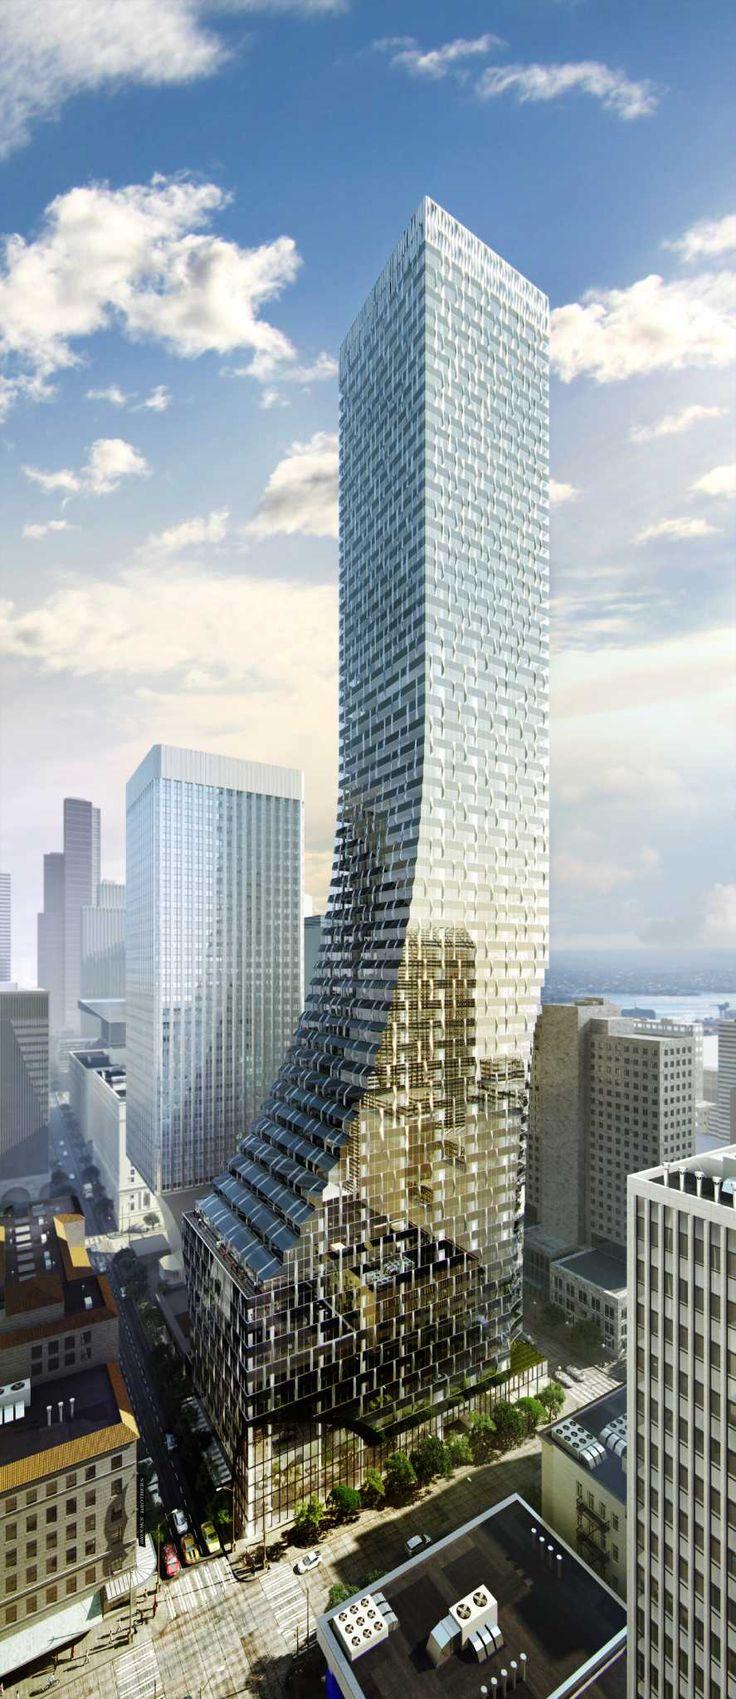 New projects in Seattle Bellevue energizes